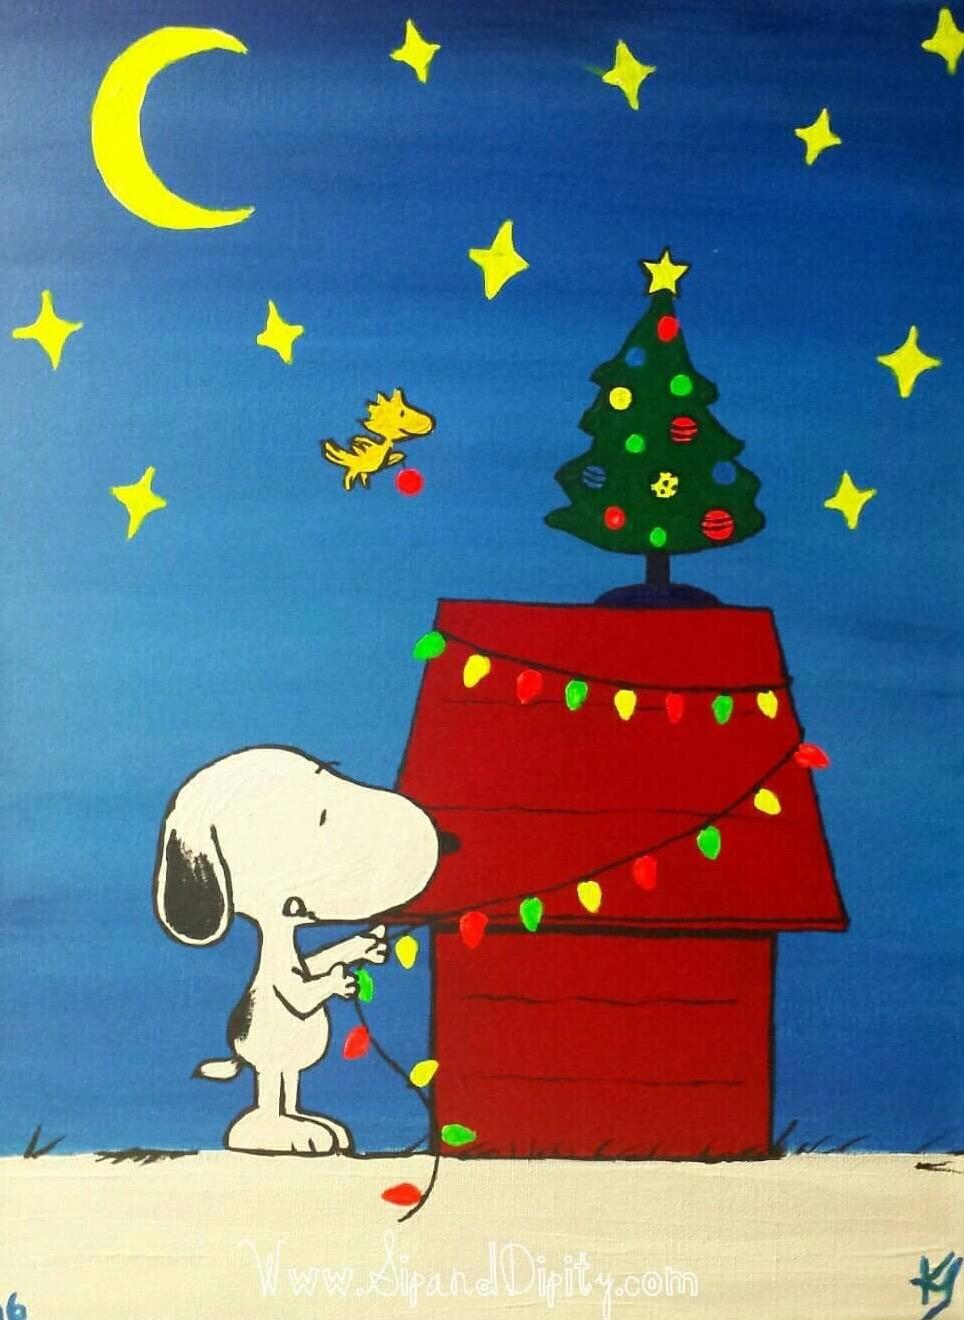 GLOW Snoopy PARTY!